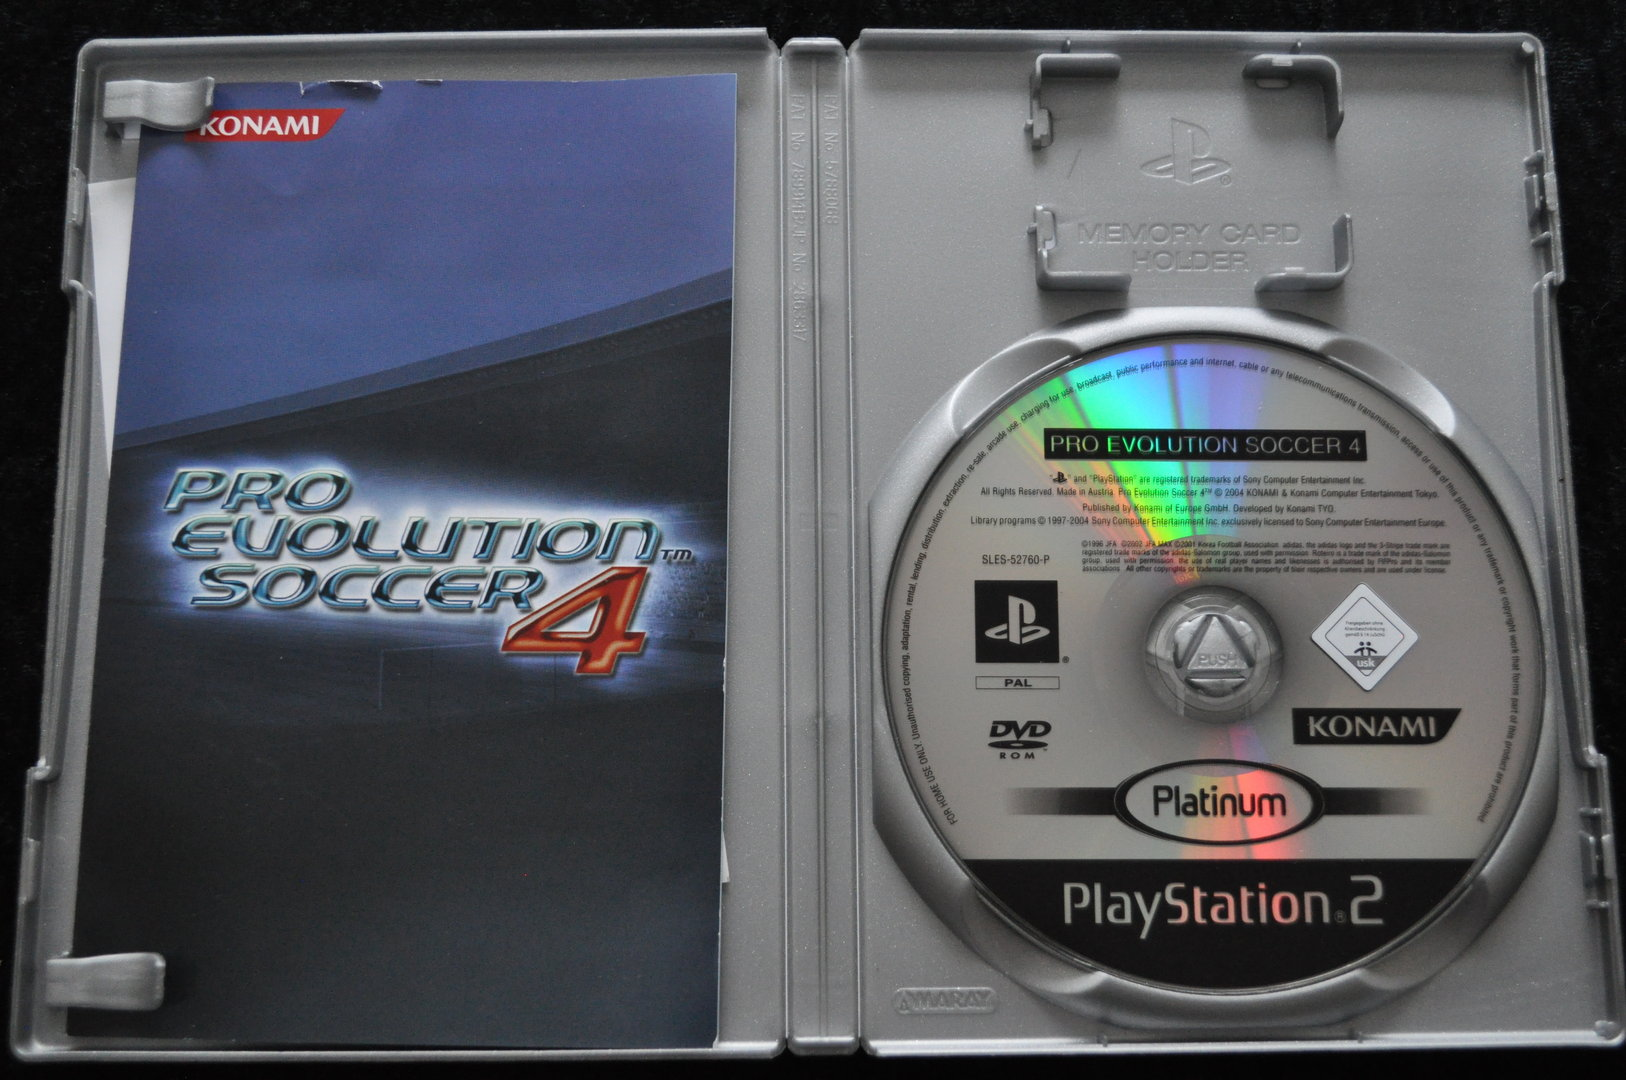 Pro Evolution Soccer 4 Playstation 2 PS2 Platinum